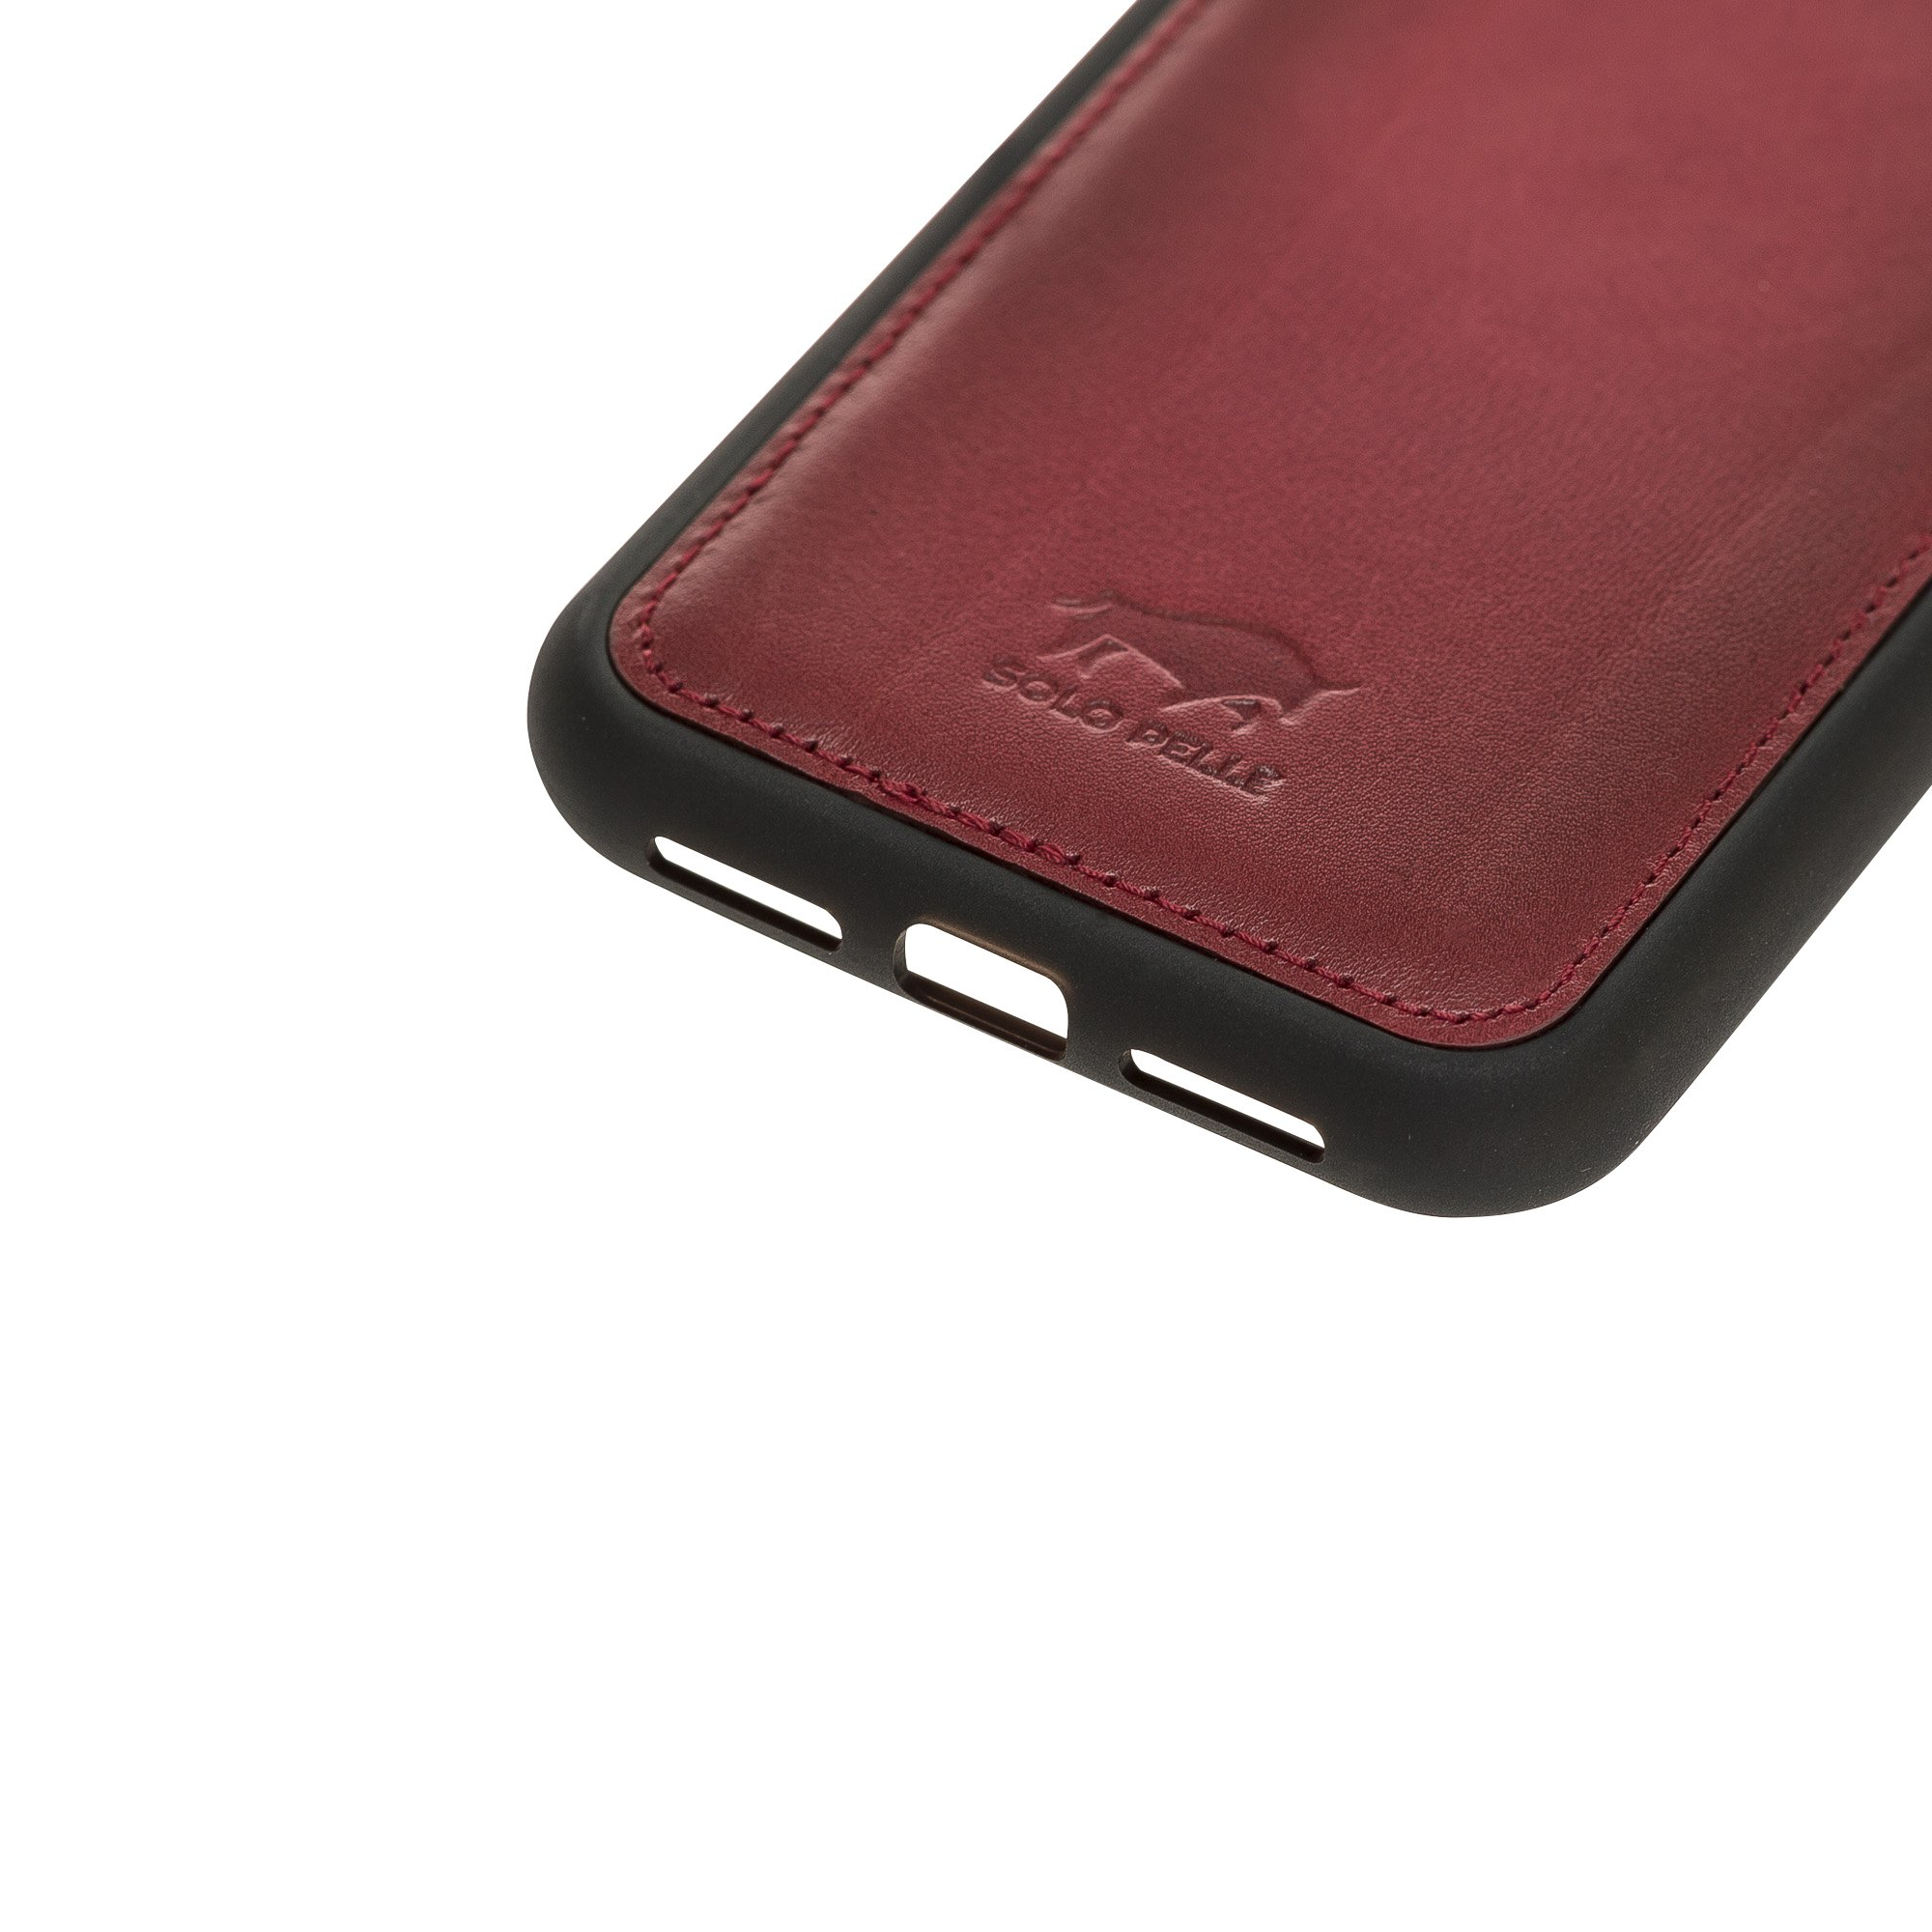 Solo Pelle Lederhülle für das iPhone 11 (XI) 6.1 Zoll Stanford Case Leder Hülle Ledertasche Backcover aus echtem Leder (Rot Burned)